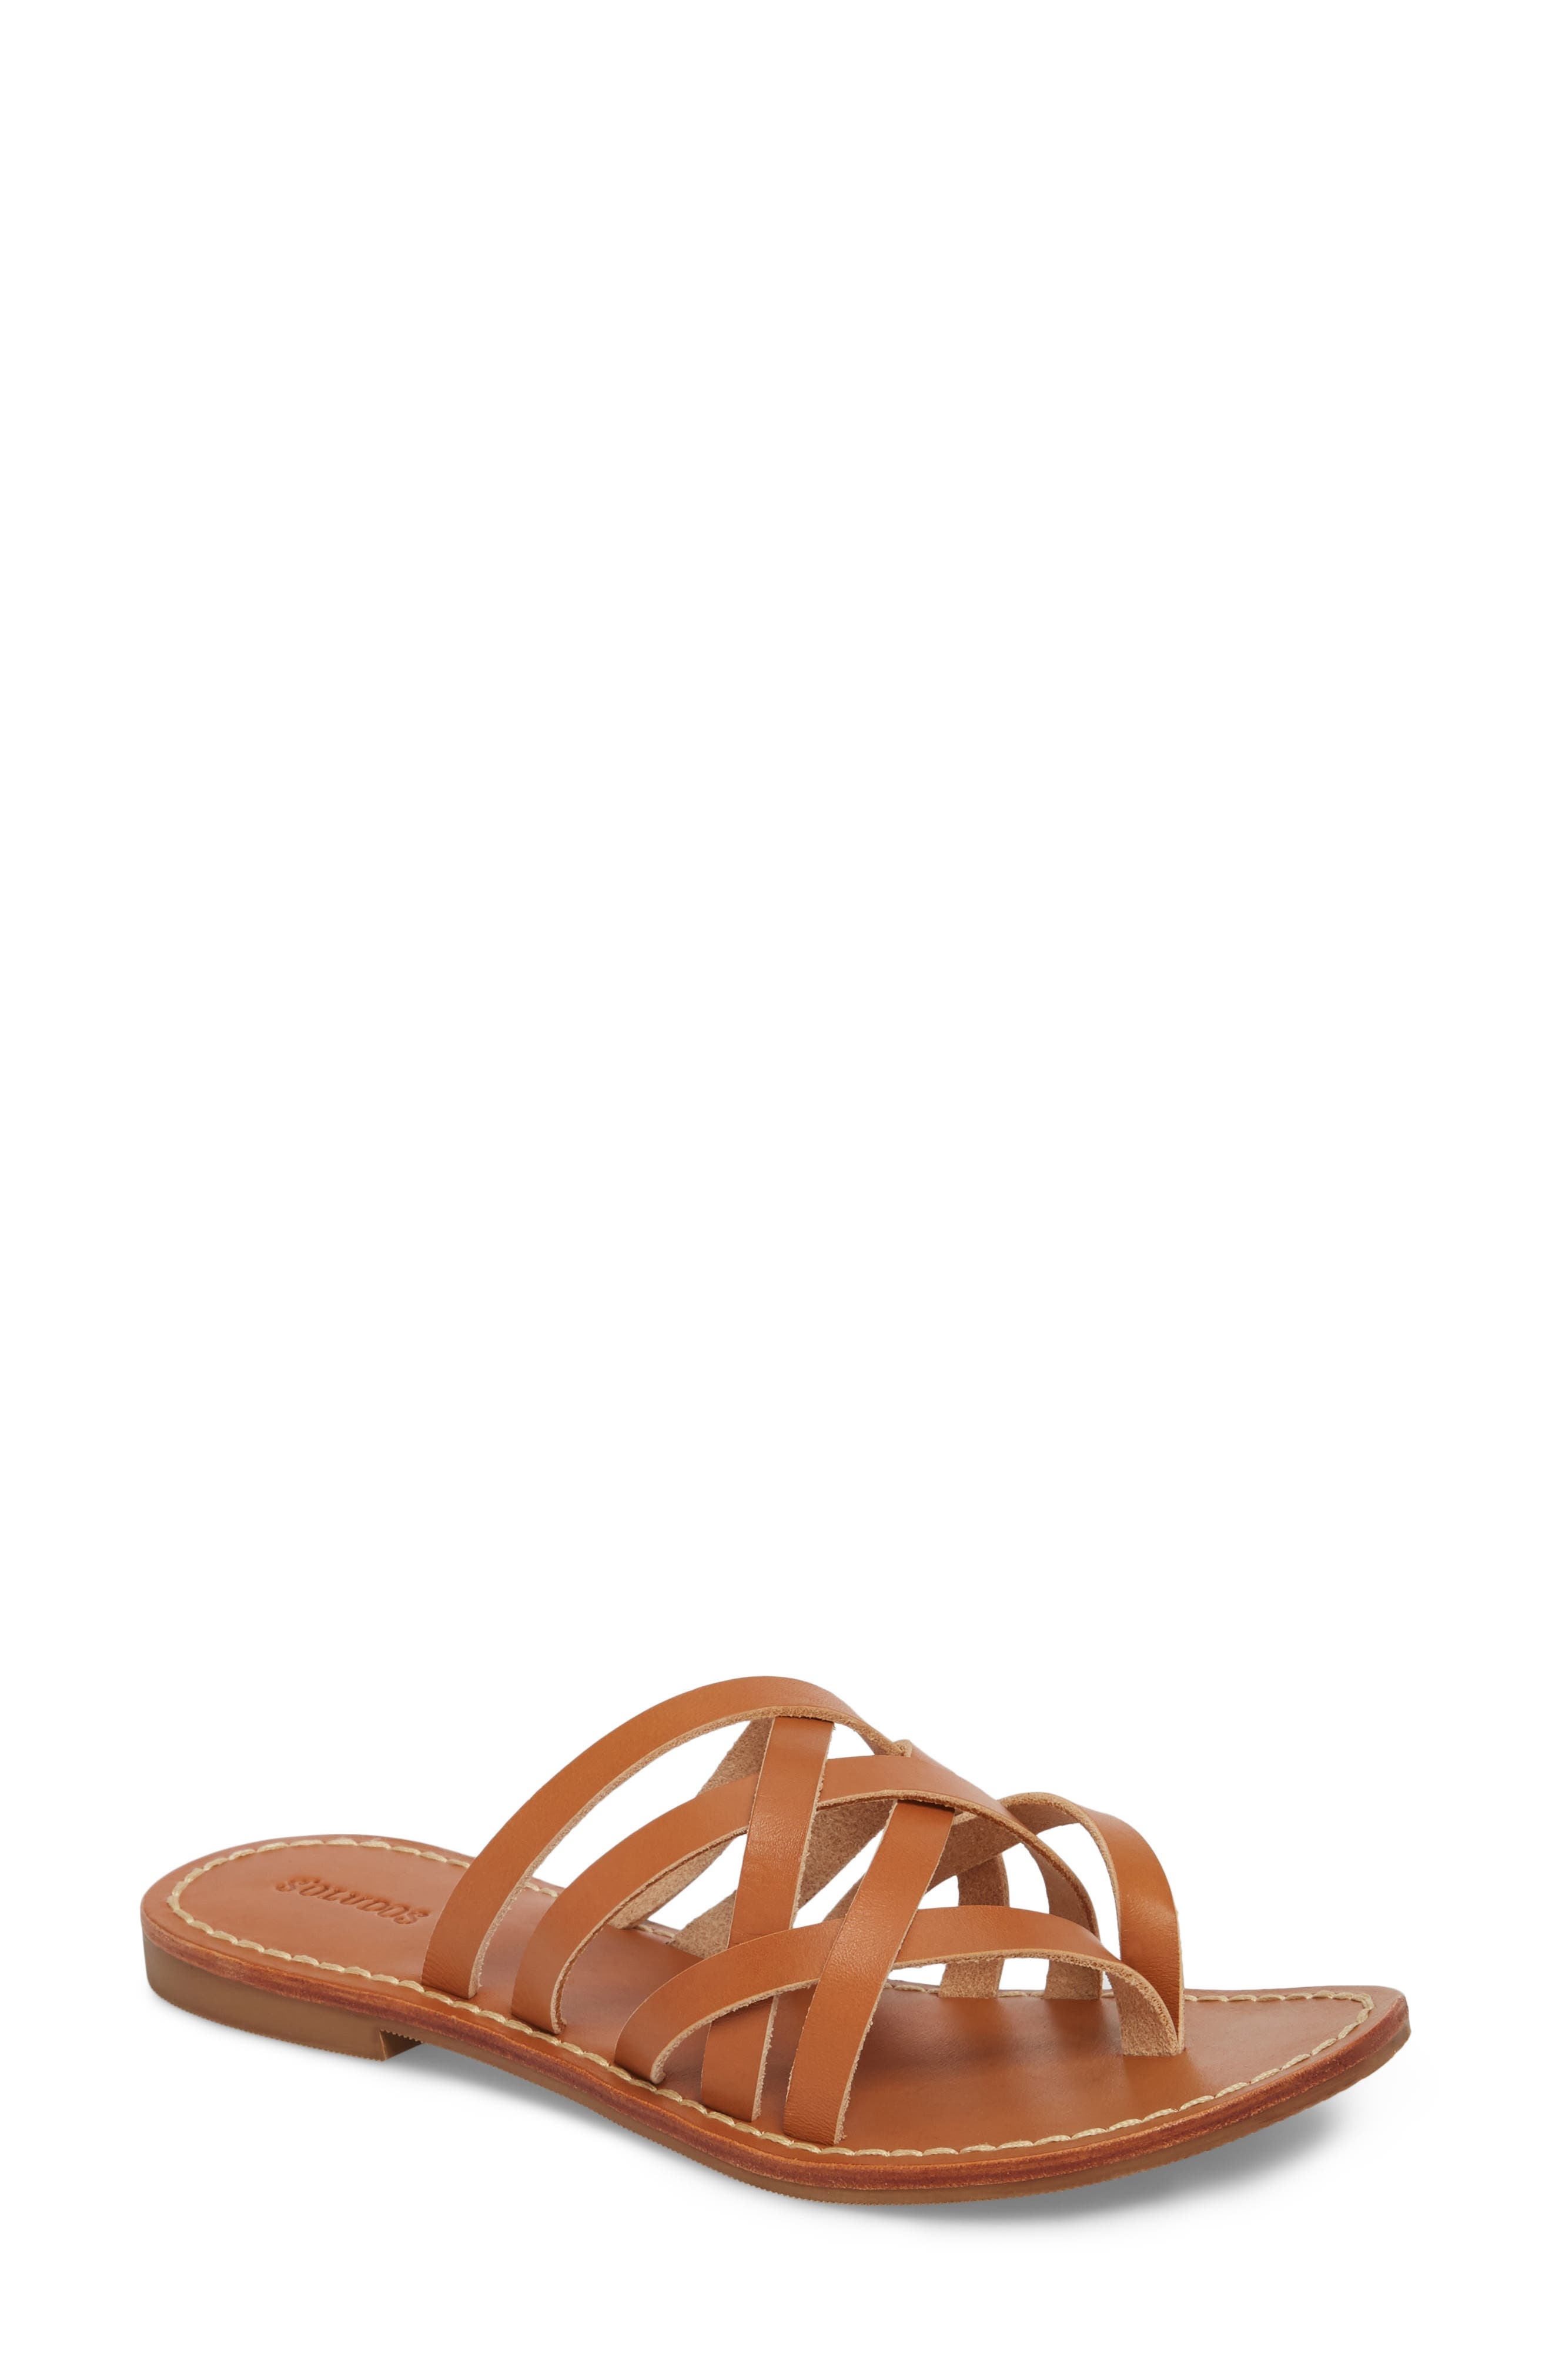 Strappy Sandal,                         Main,                         color, 250